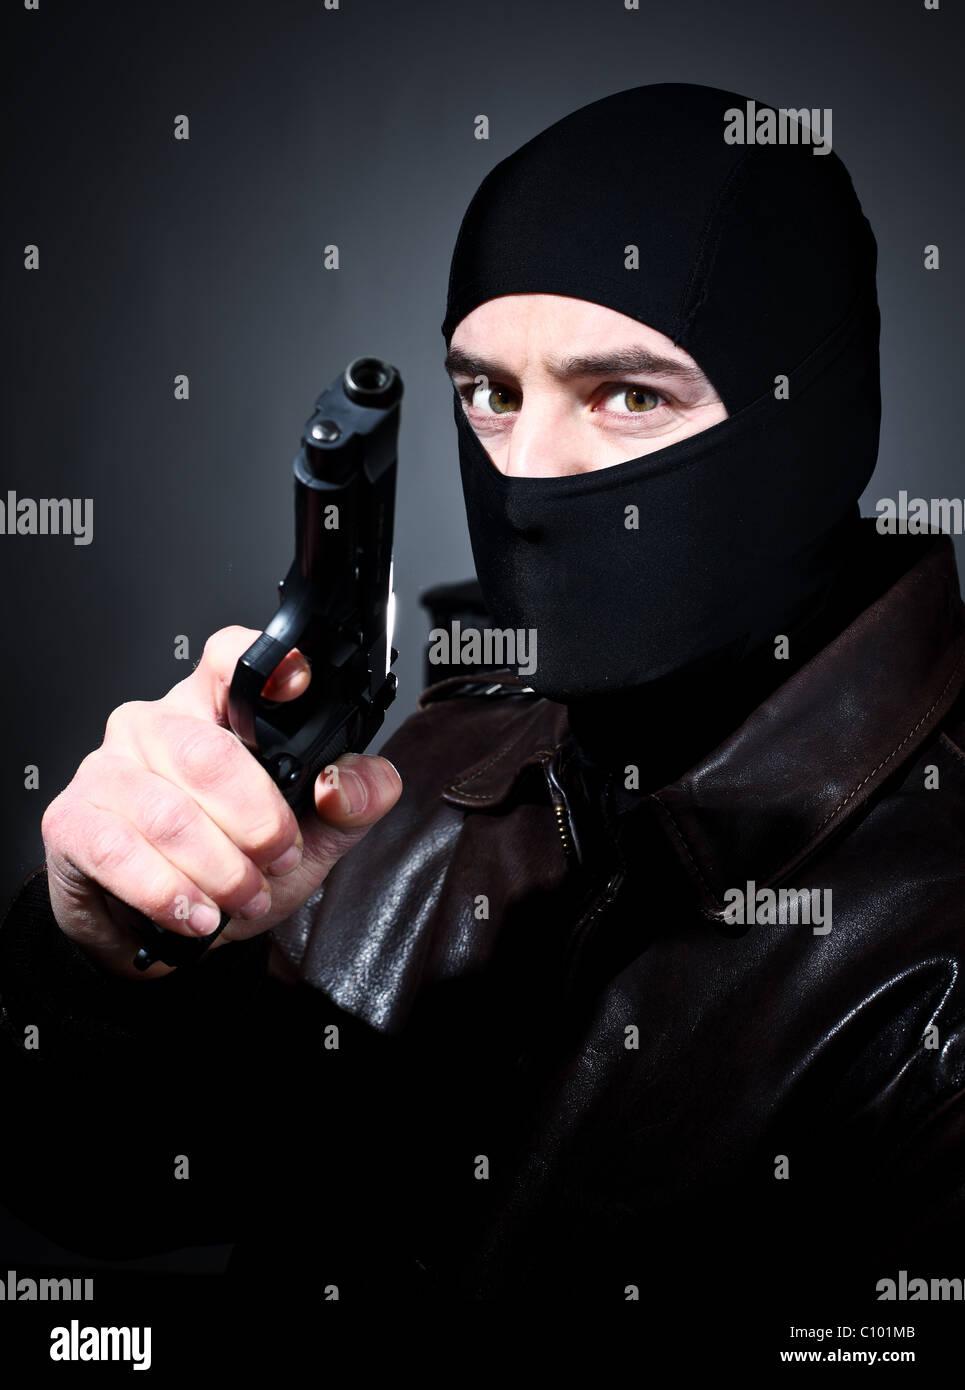 fine closeup portrait of criminal holding pistol - Stock Image